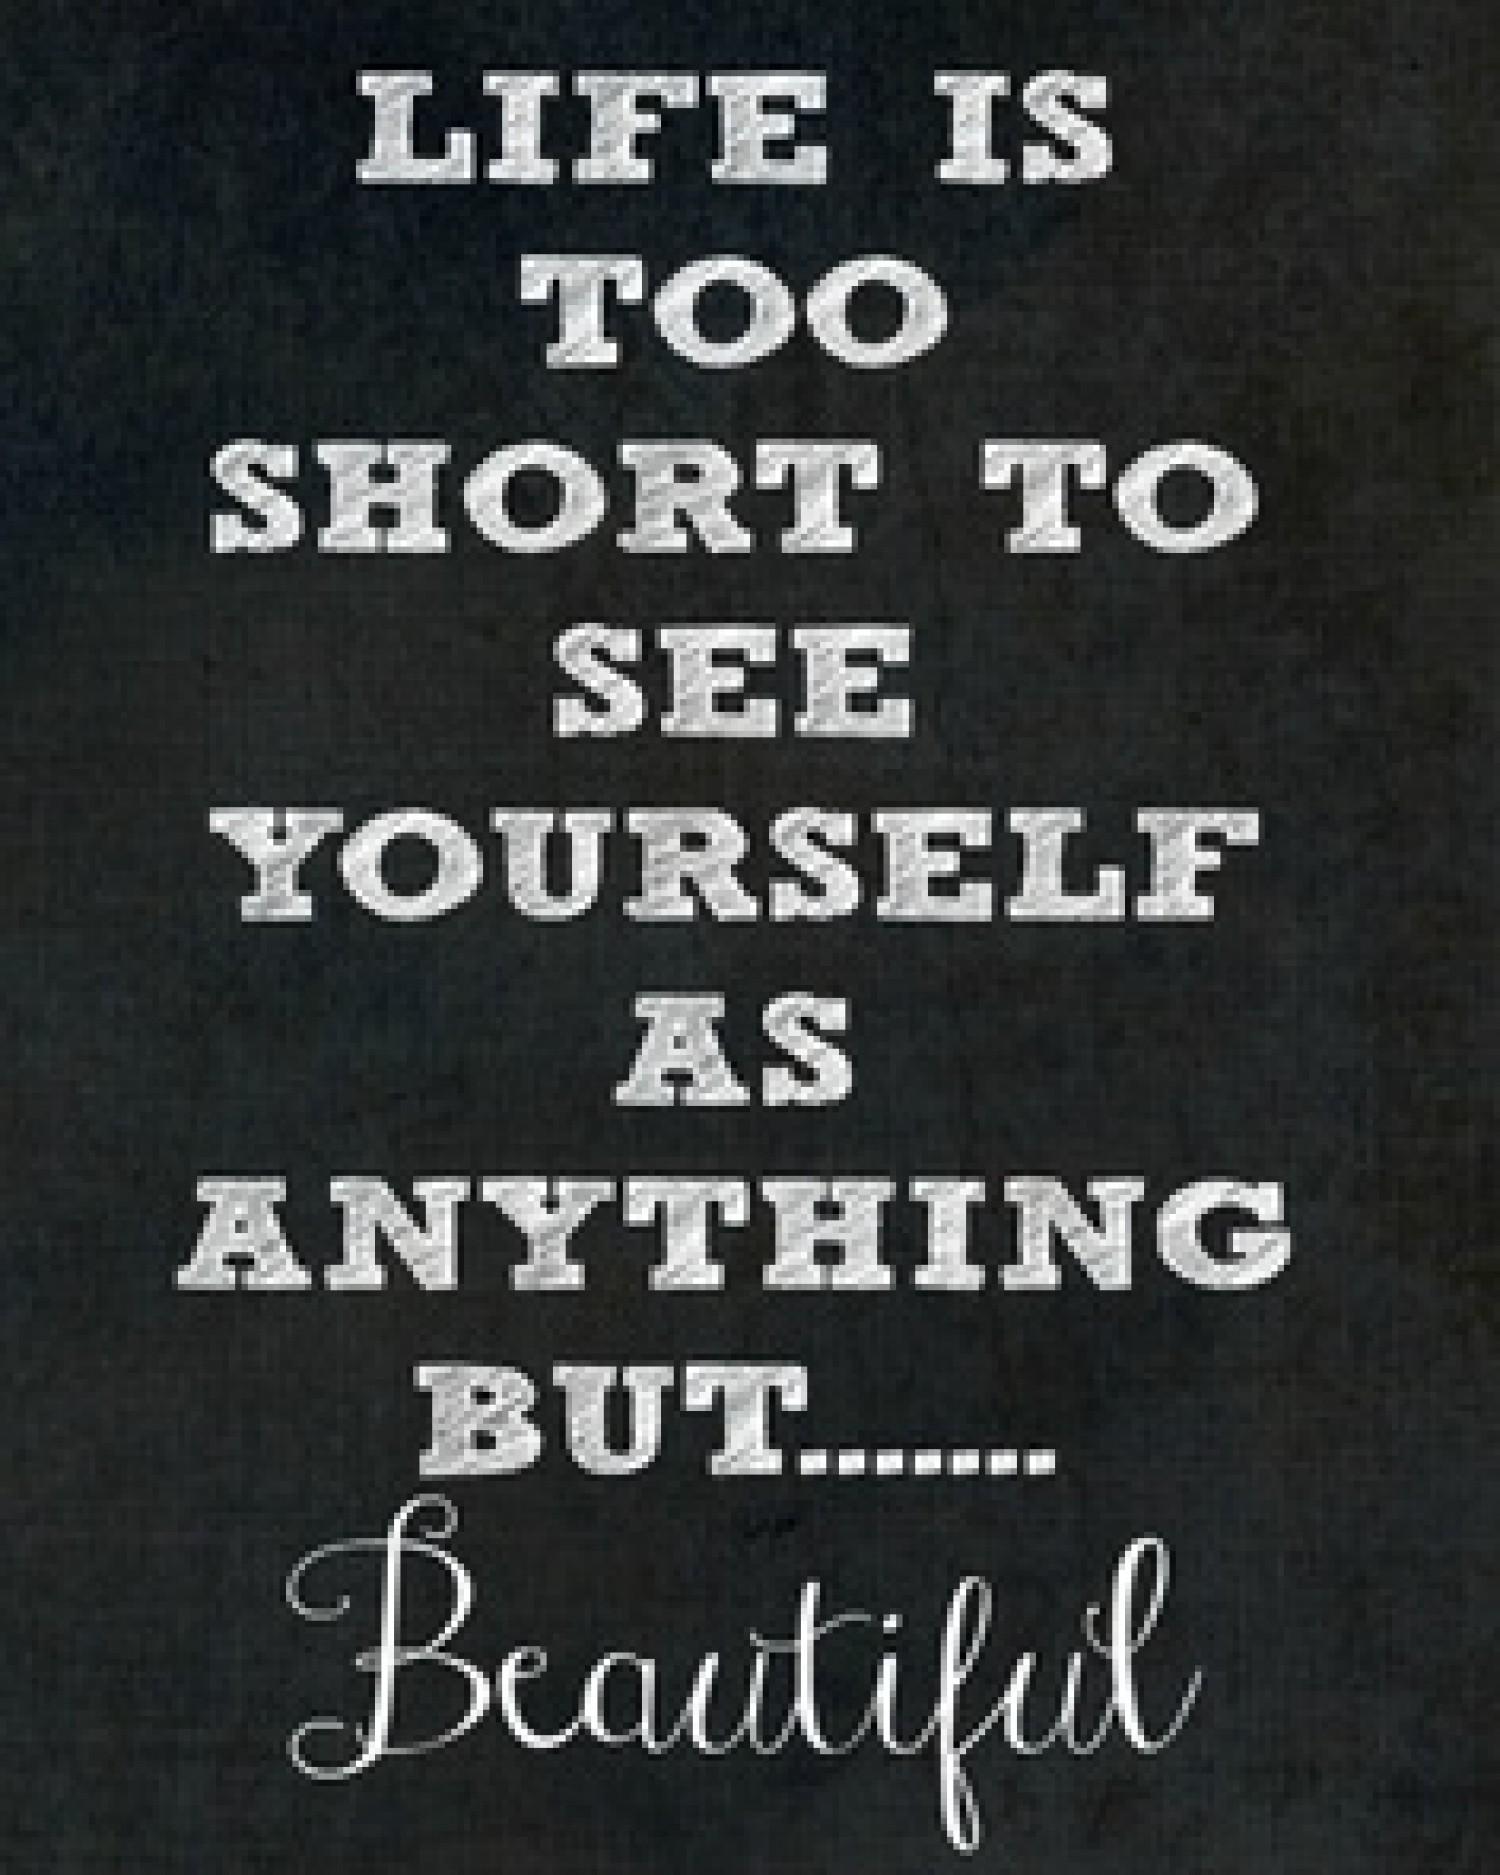 26 uplifting quotes